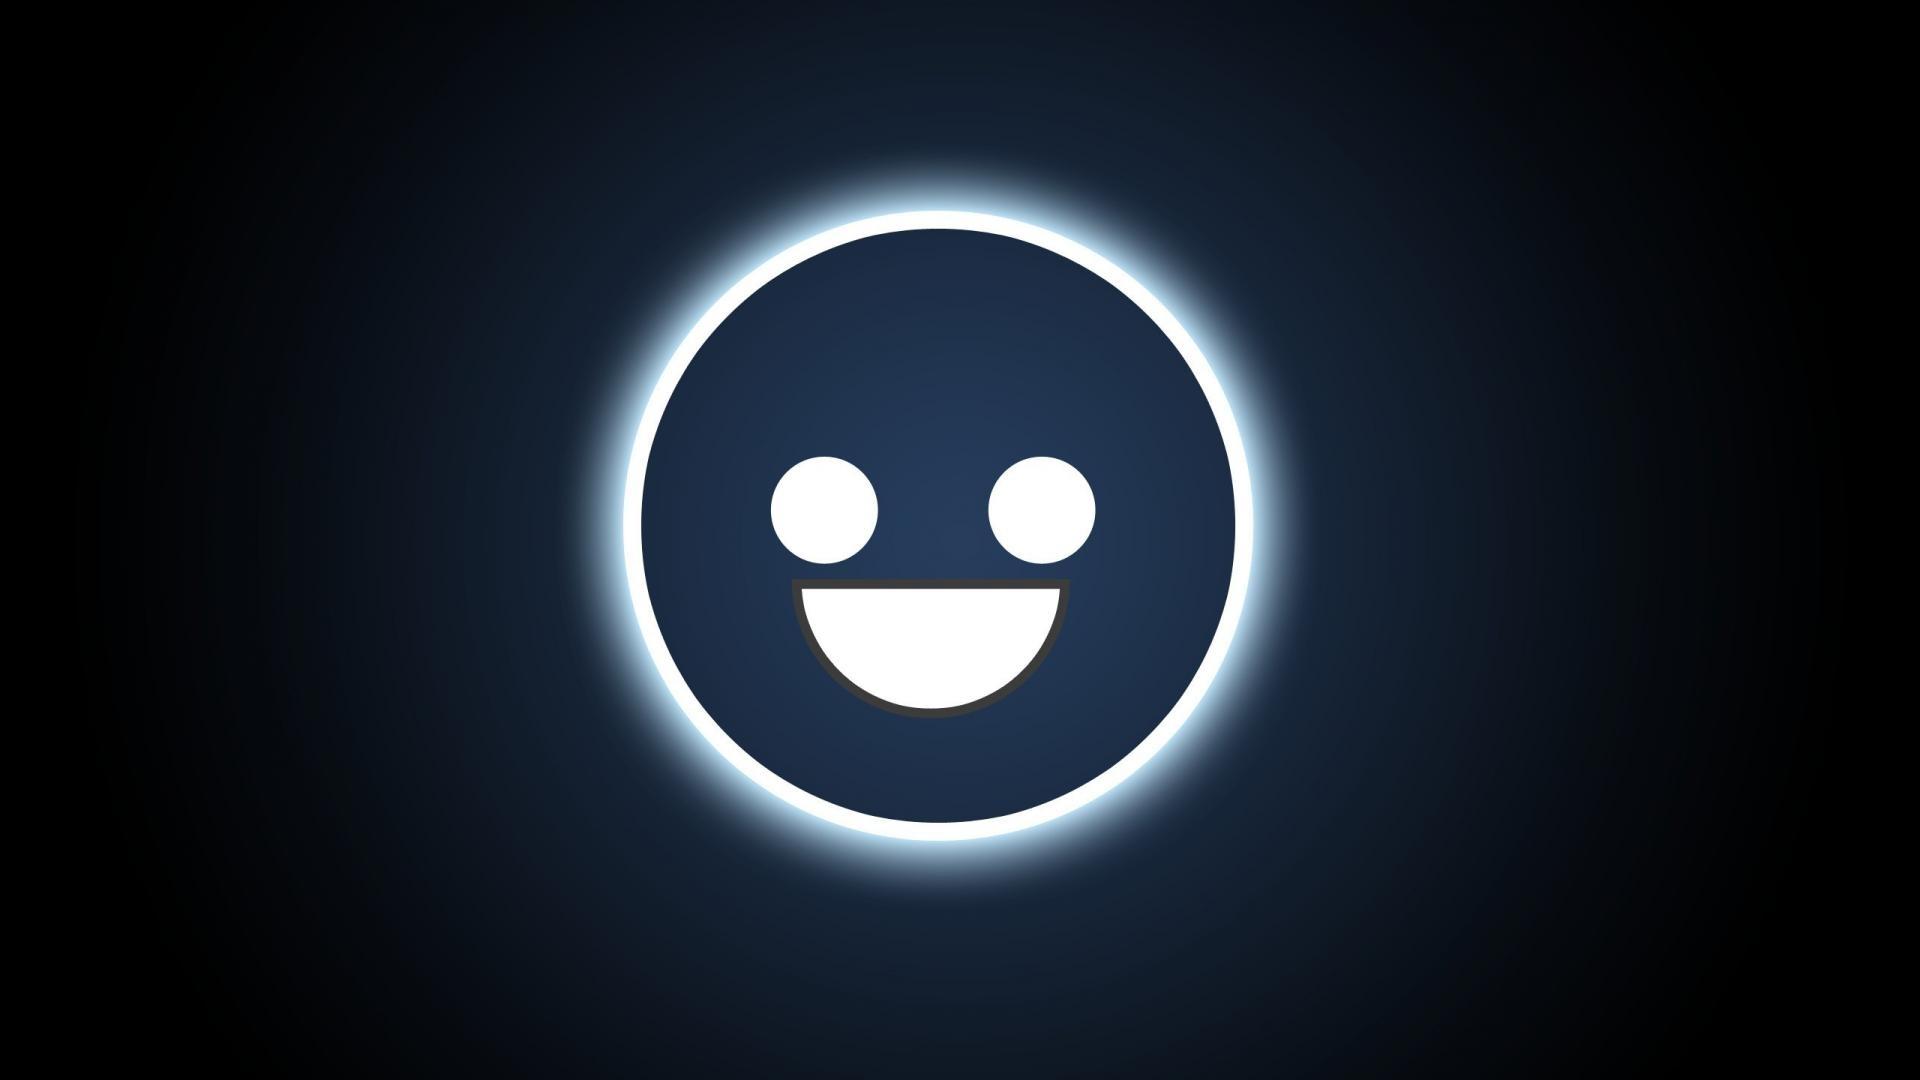 smiley face icons simplistic black background symbols wallpaper